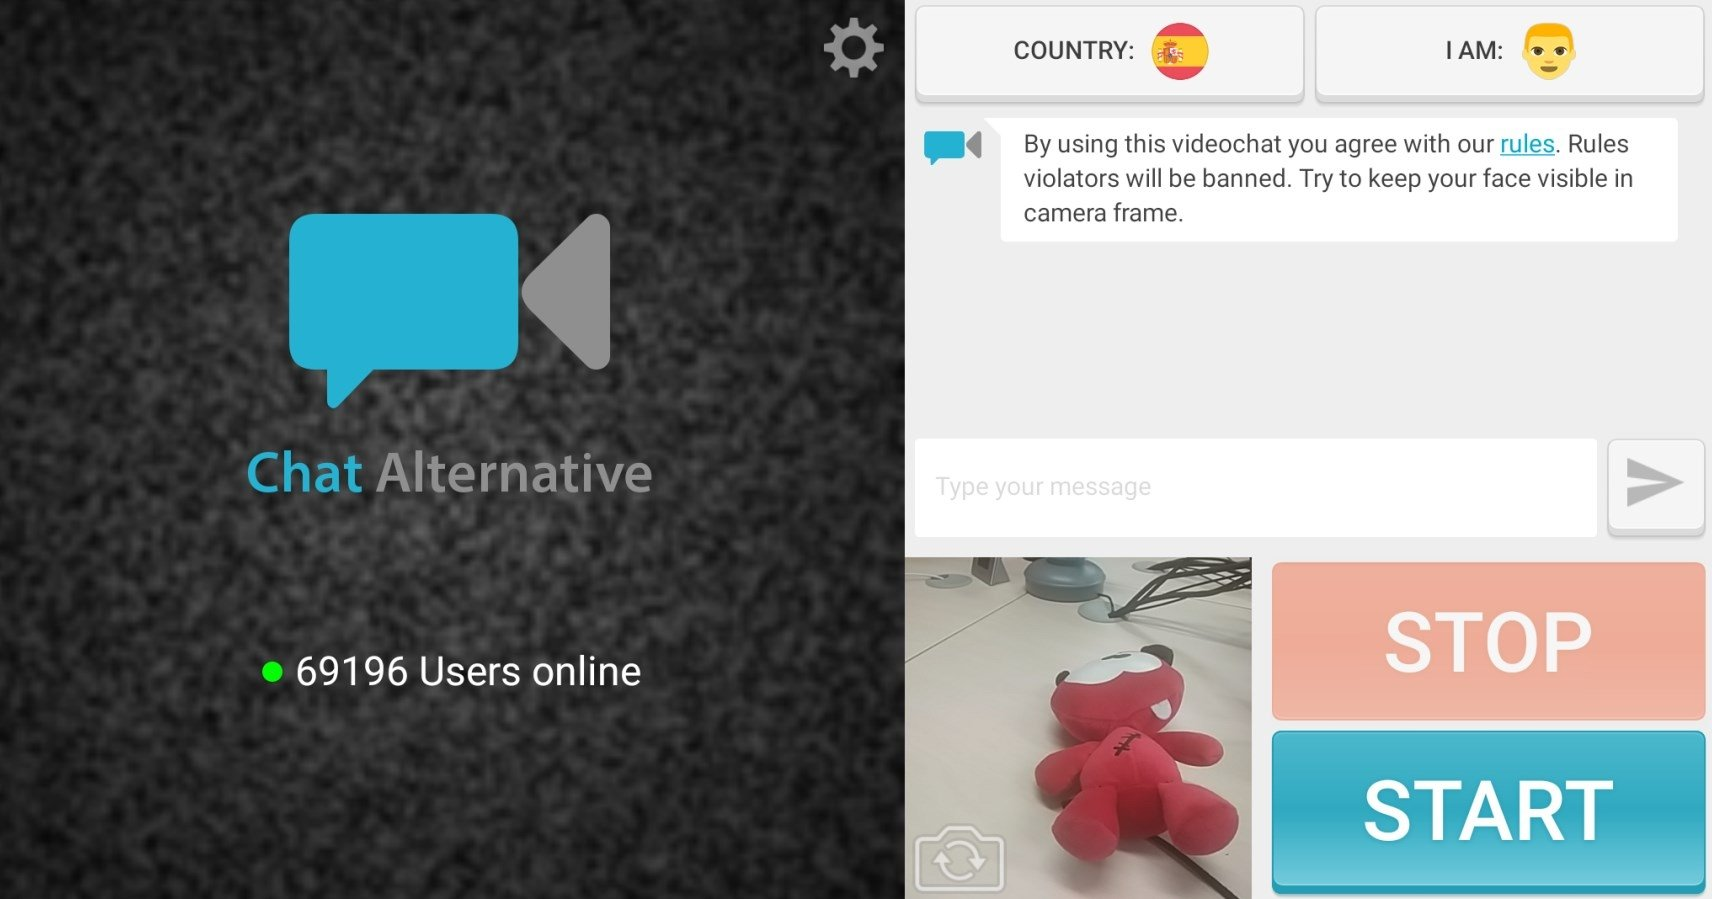 Chat Alternative 604025 - Descargar para Android APK Gratis